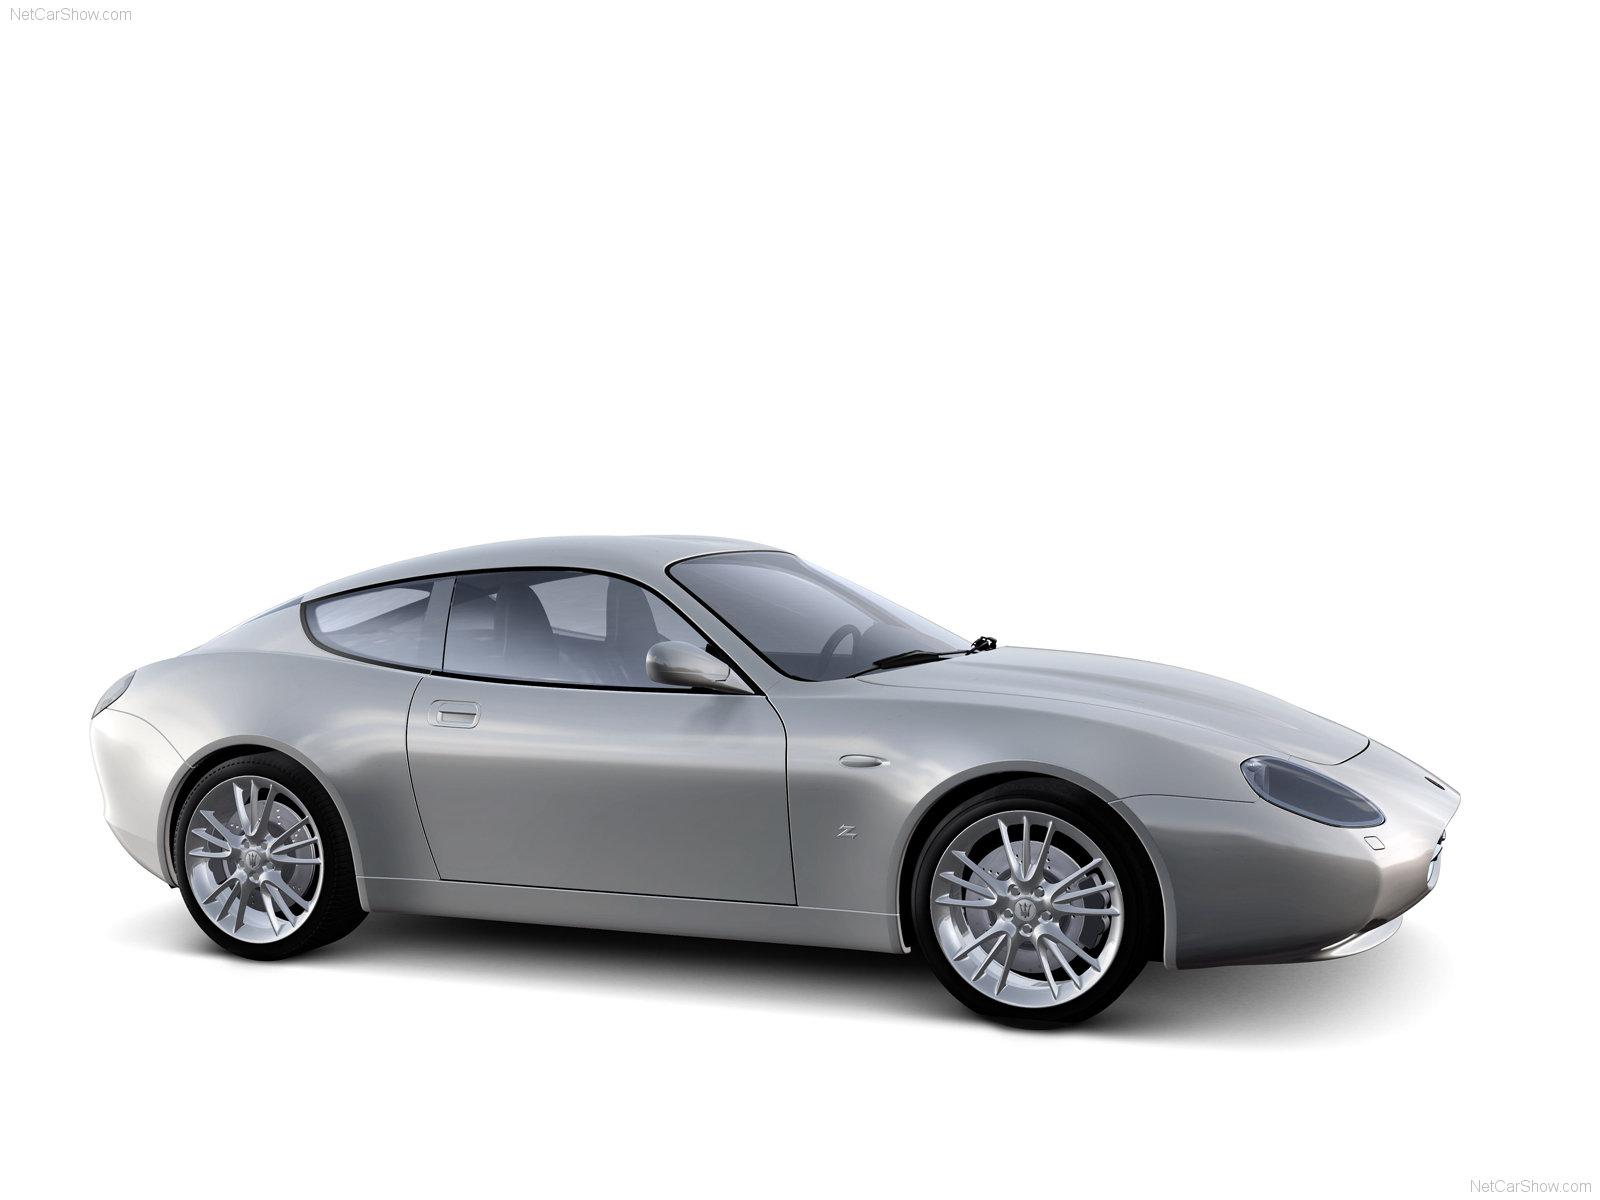 Hình ảnh siêu xe Maserati GS Zagato 2007 & nội ngoại thất